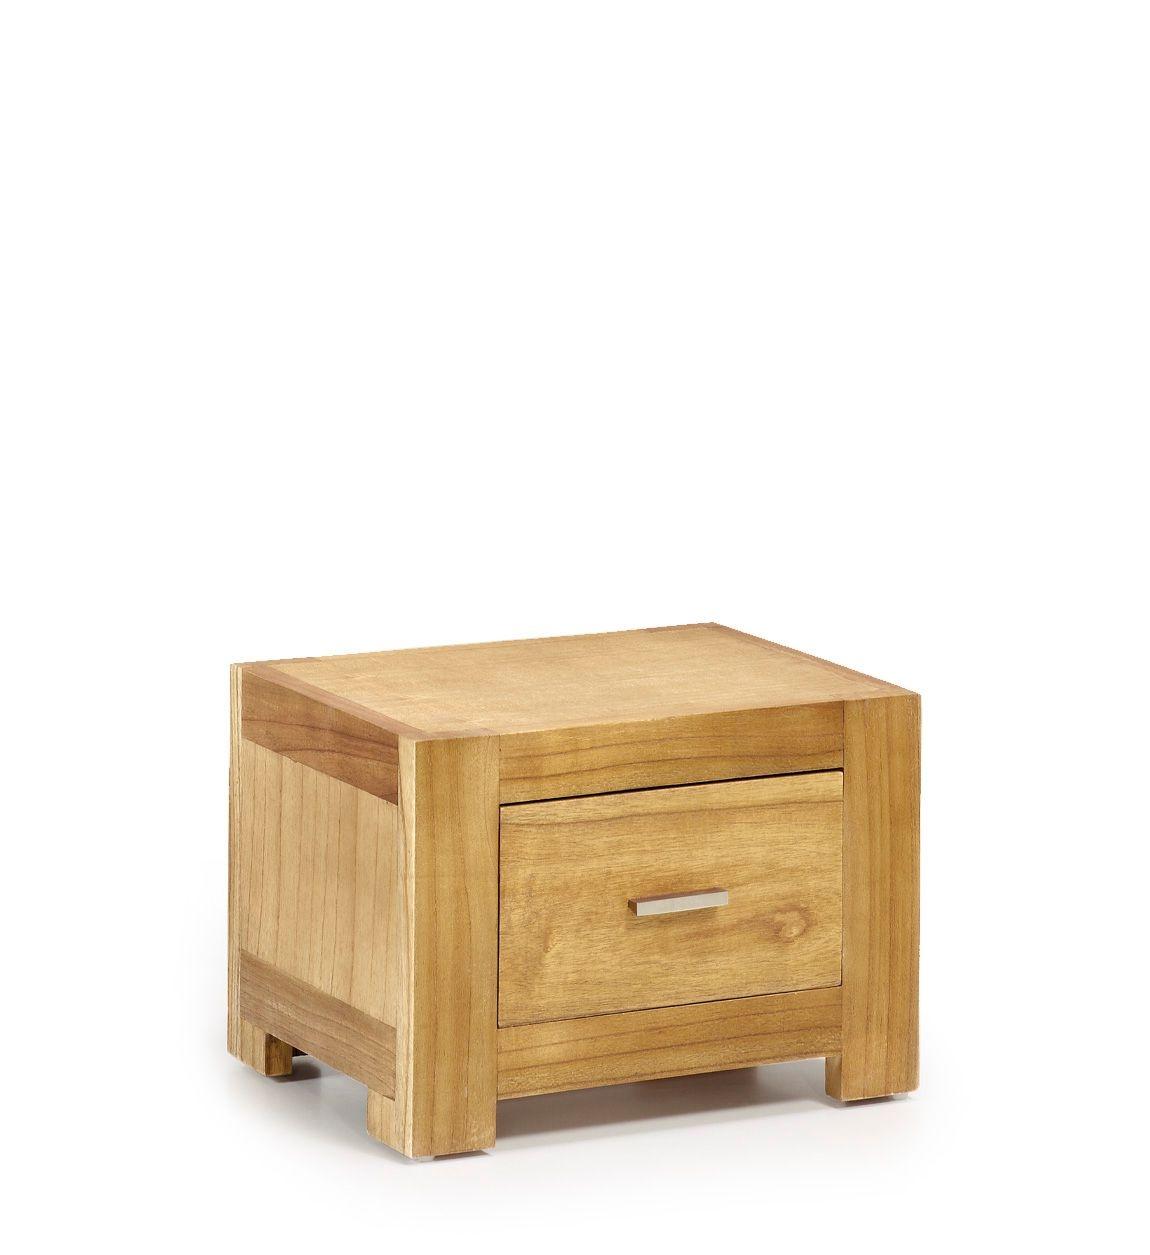 Noptiera din lemn, cu 1 sertar Mesita Natural, l50xA35xH35 cm imagine